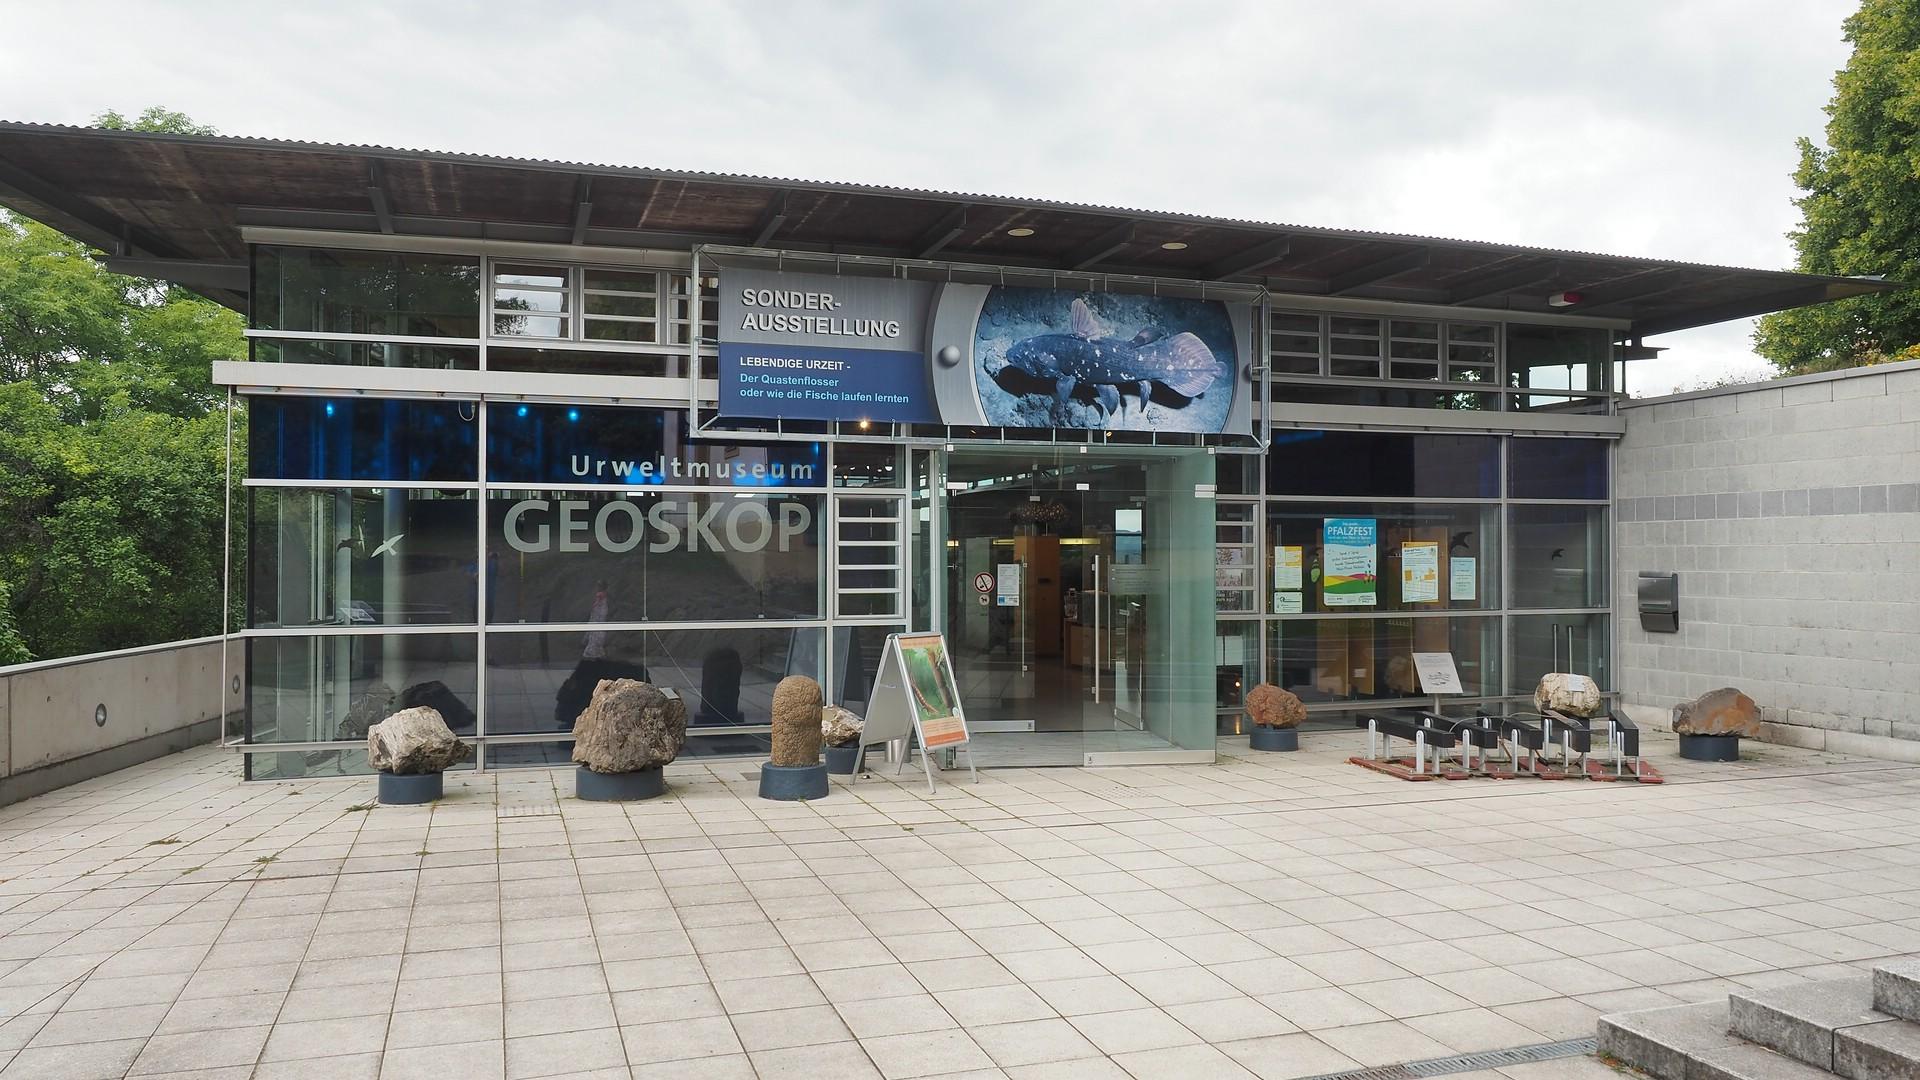 Museum Geoskop